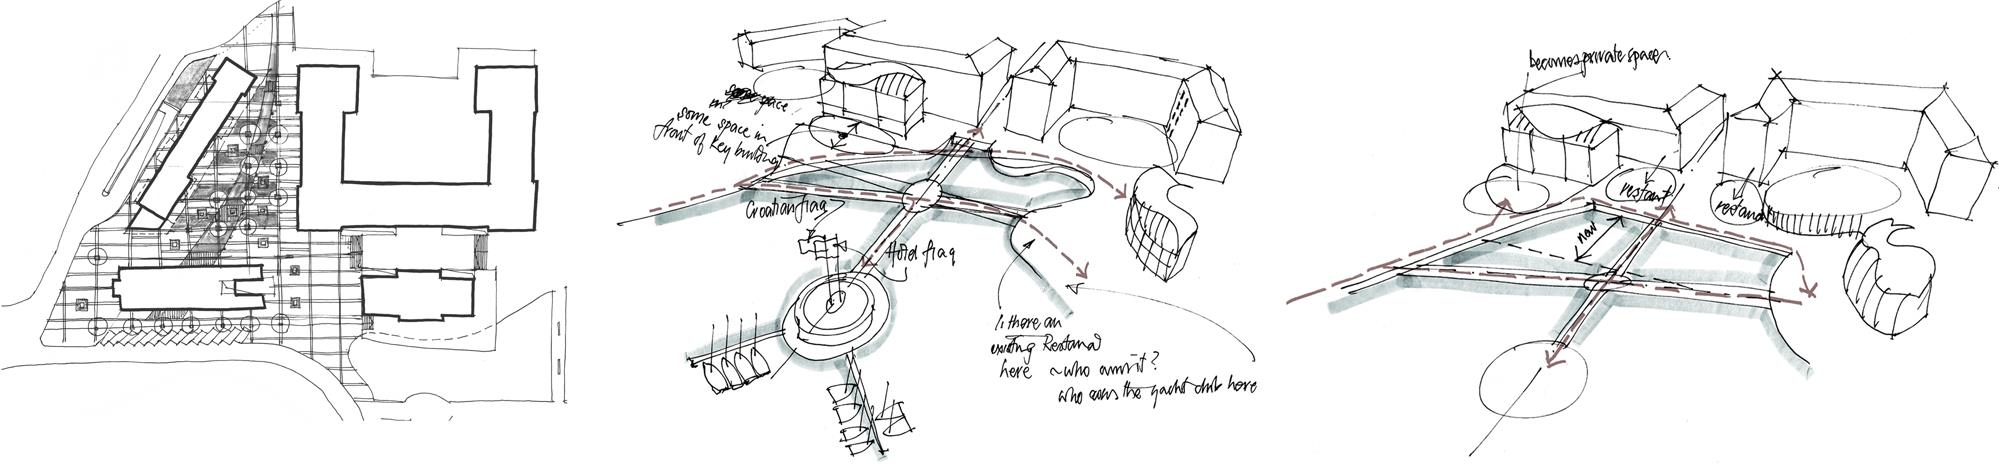 WKK Grand Hotel Rovinj-Initial Sketches.jpg